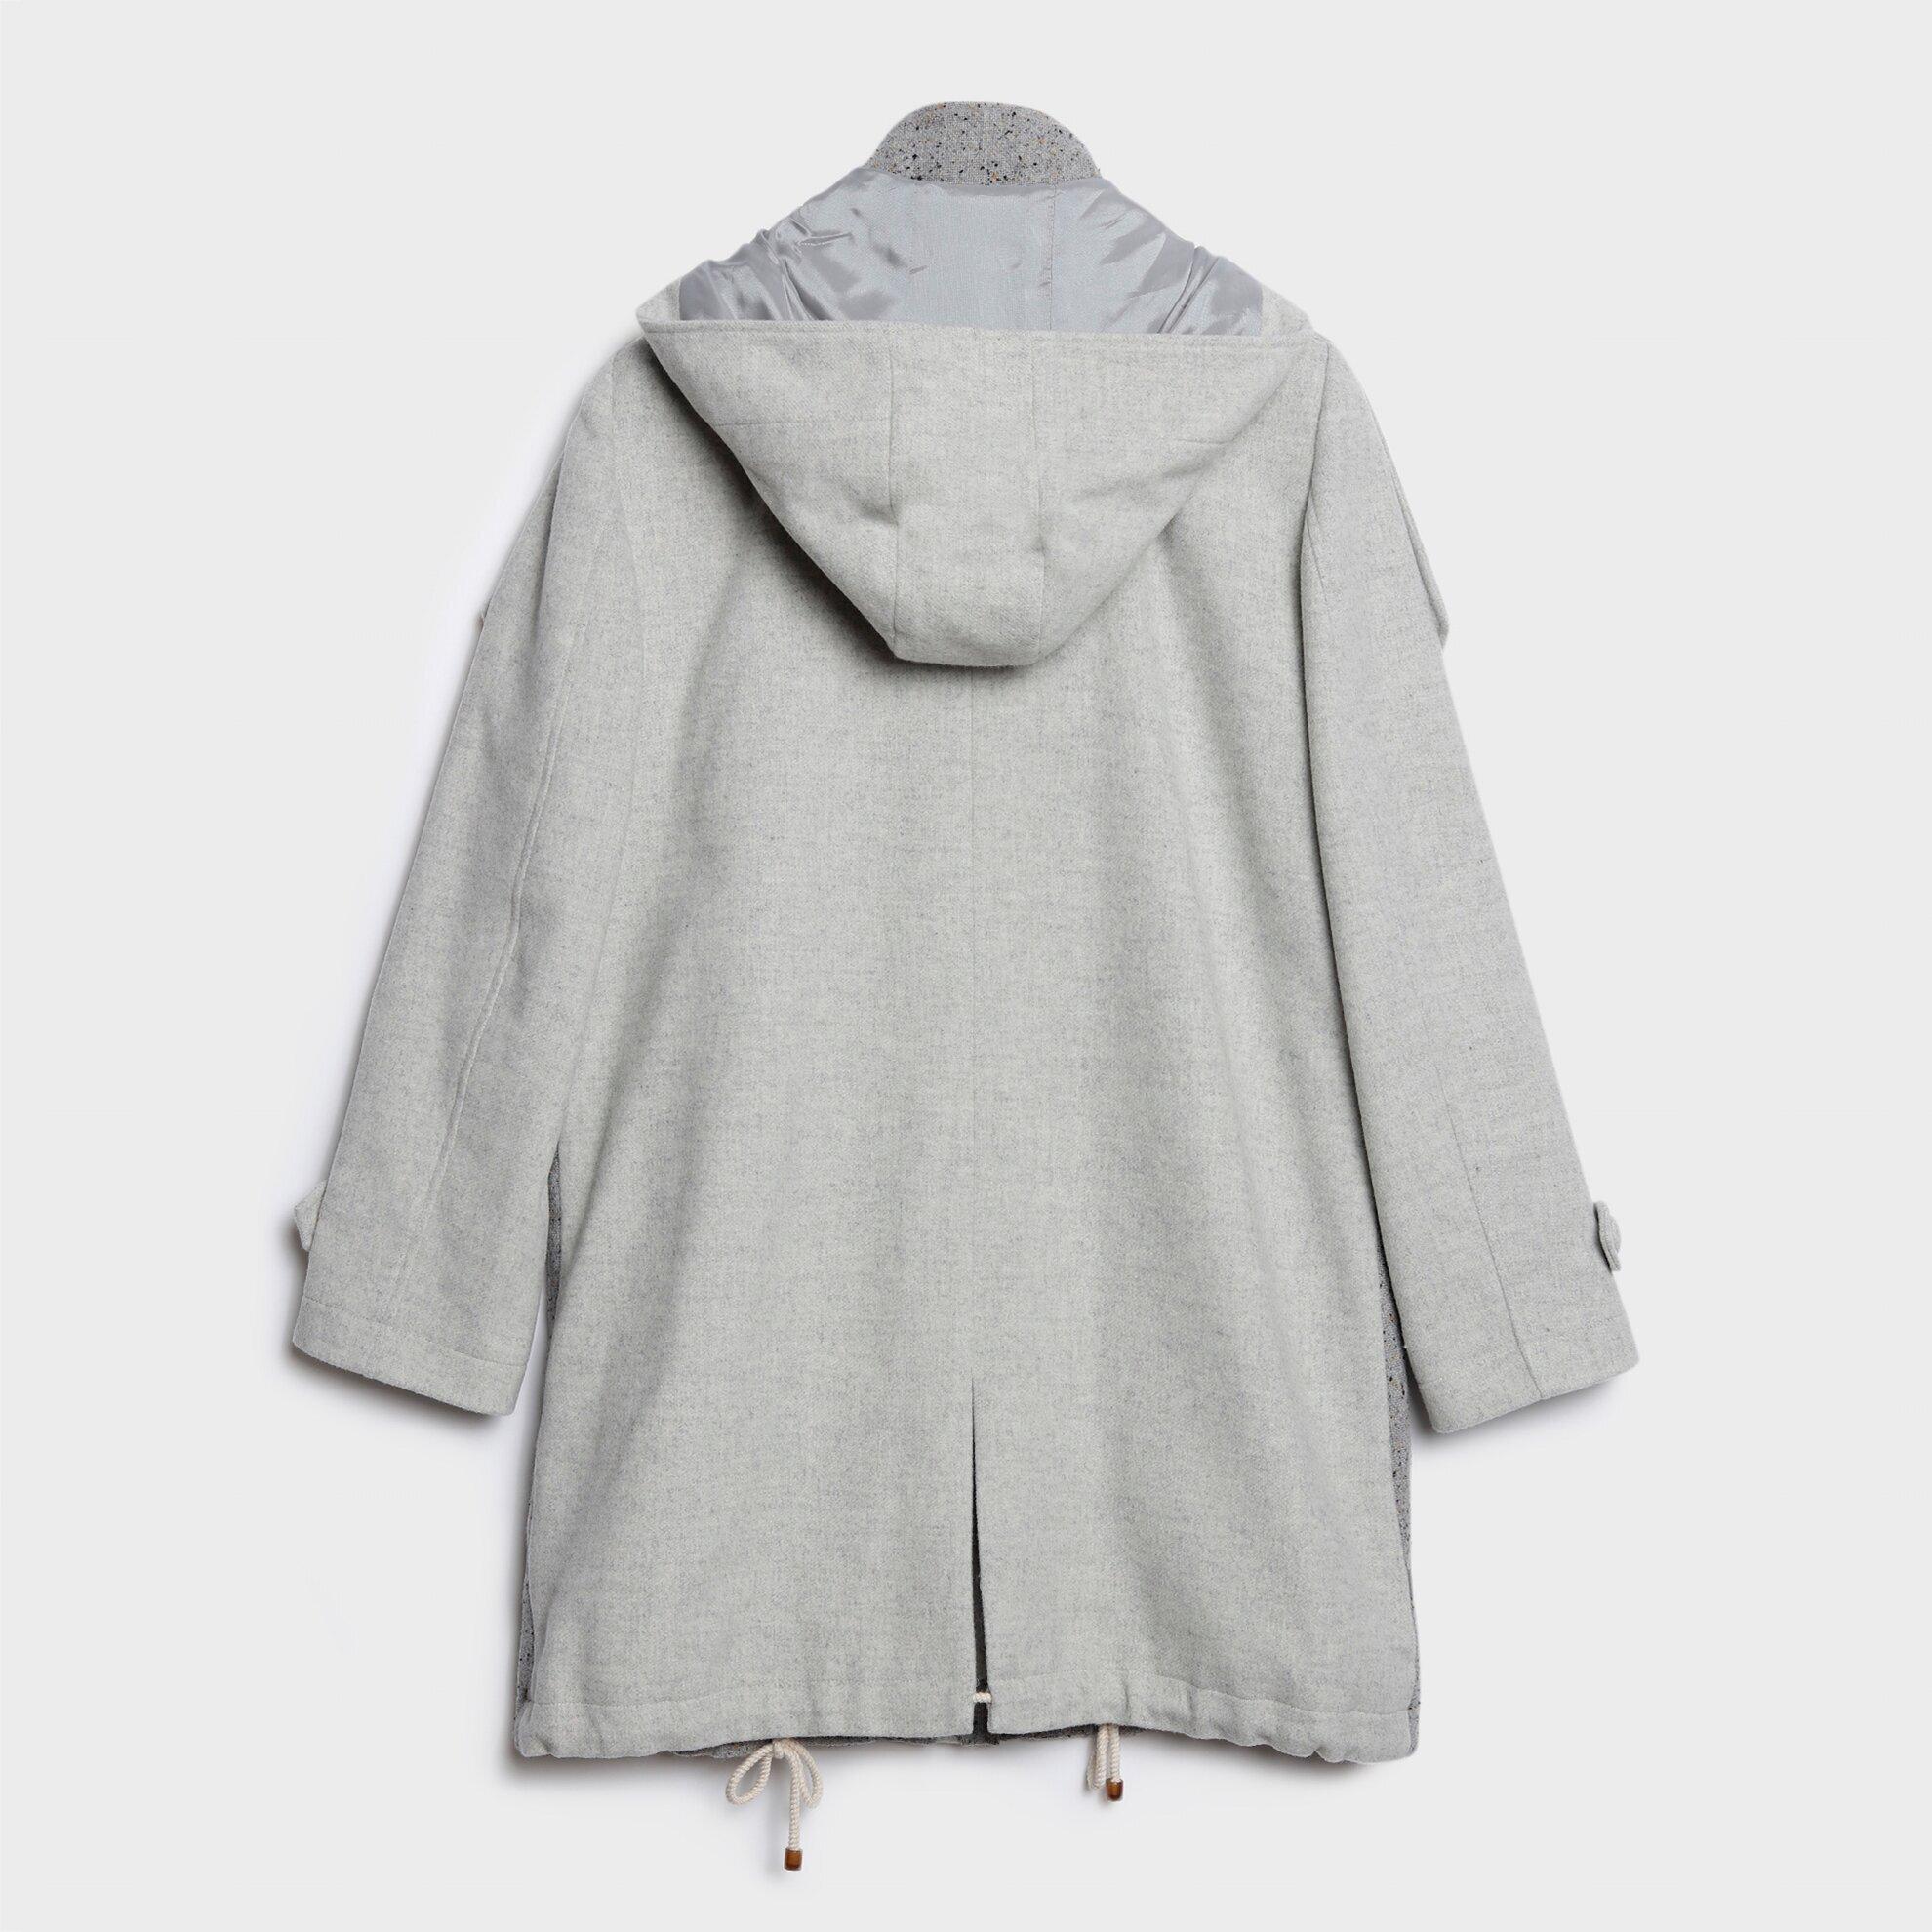 Apolet Detaylı Palto